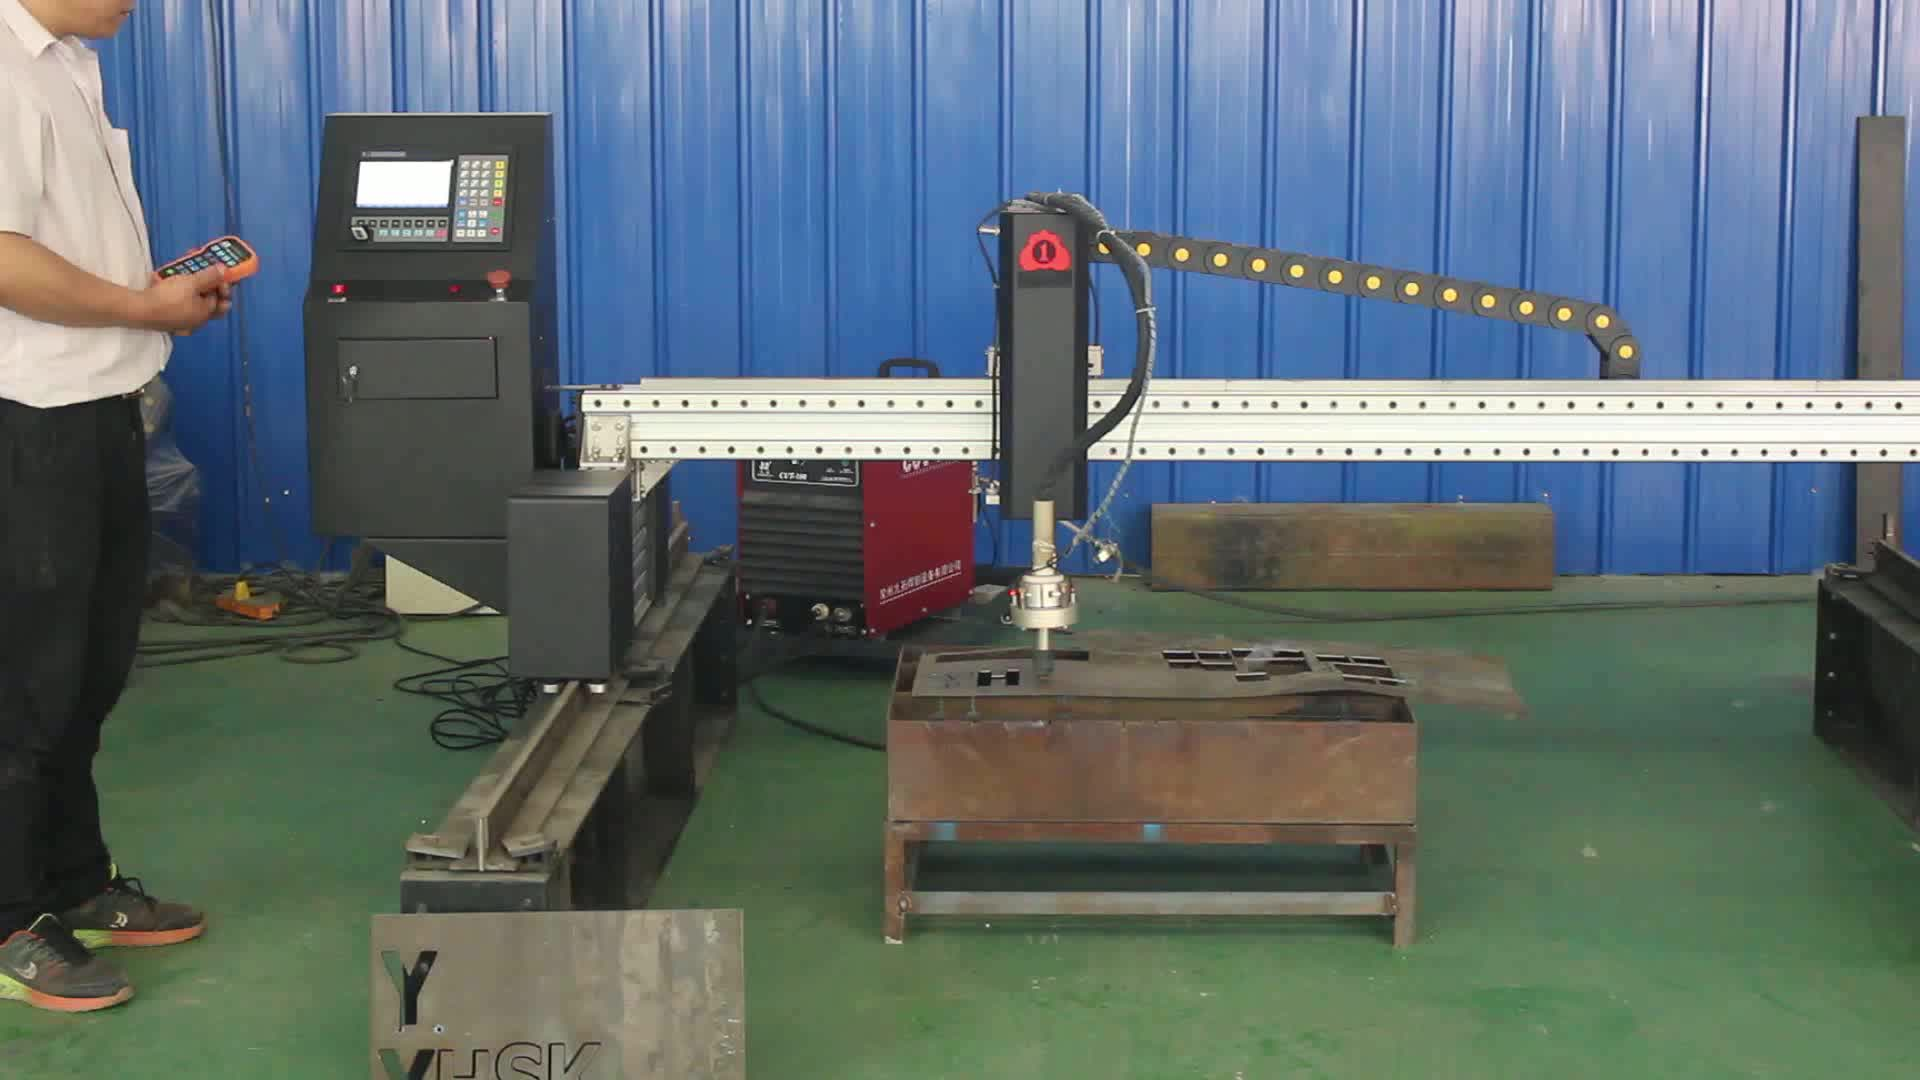 Chất Lượng cao CNC Máy Cắt Plasma, Plasma Máy Cắt Kim Loại